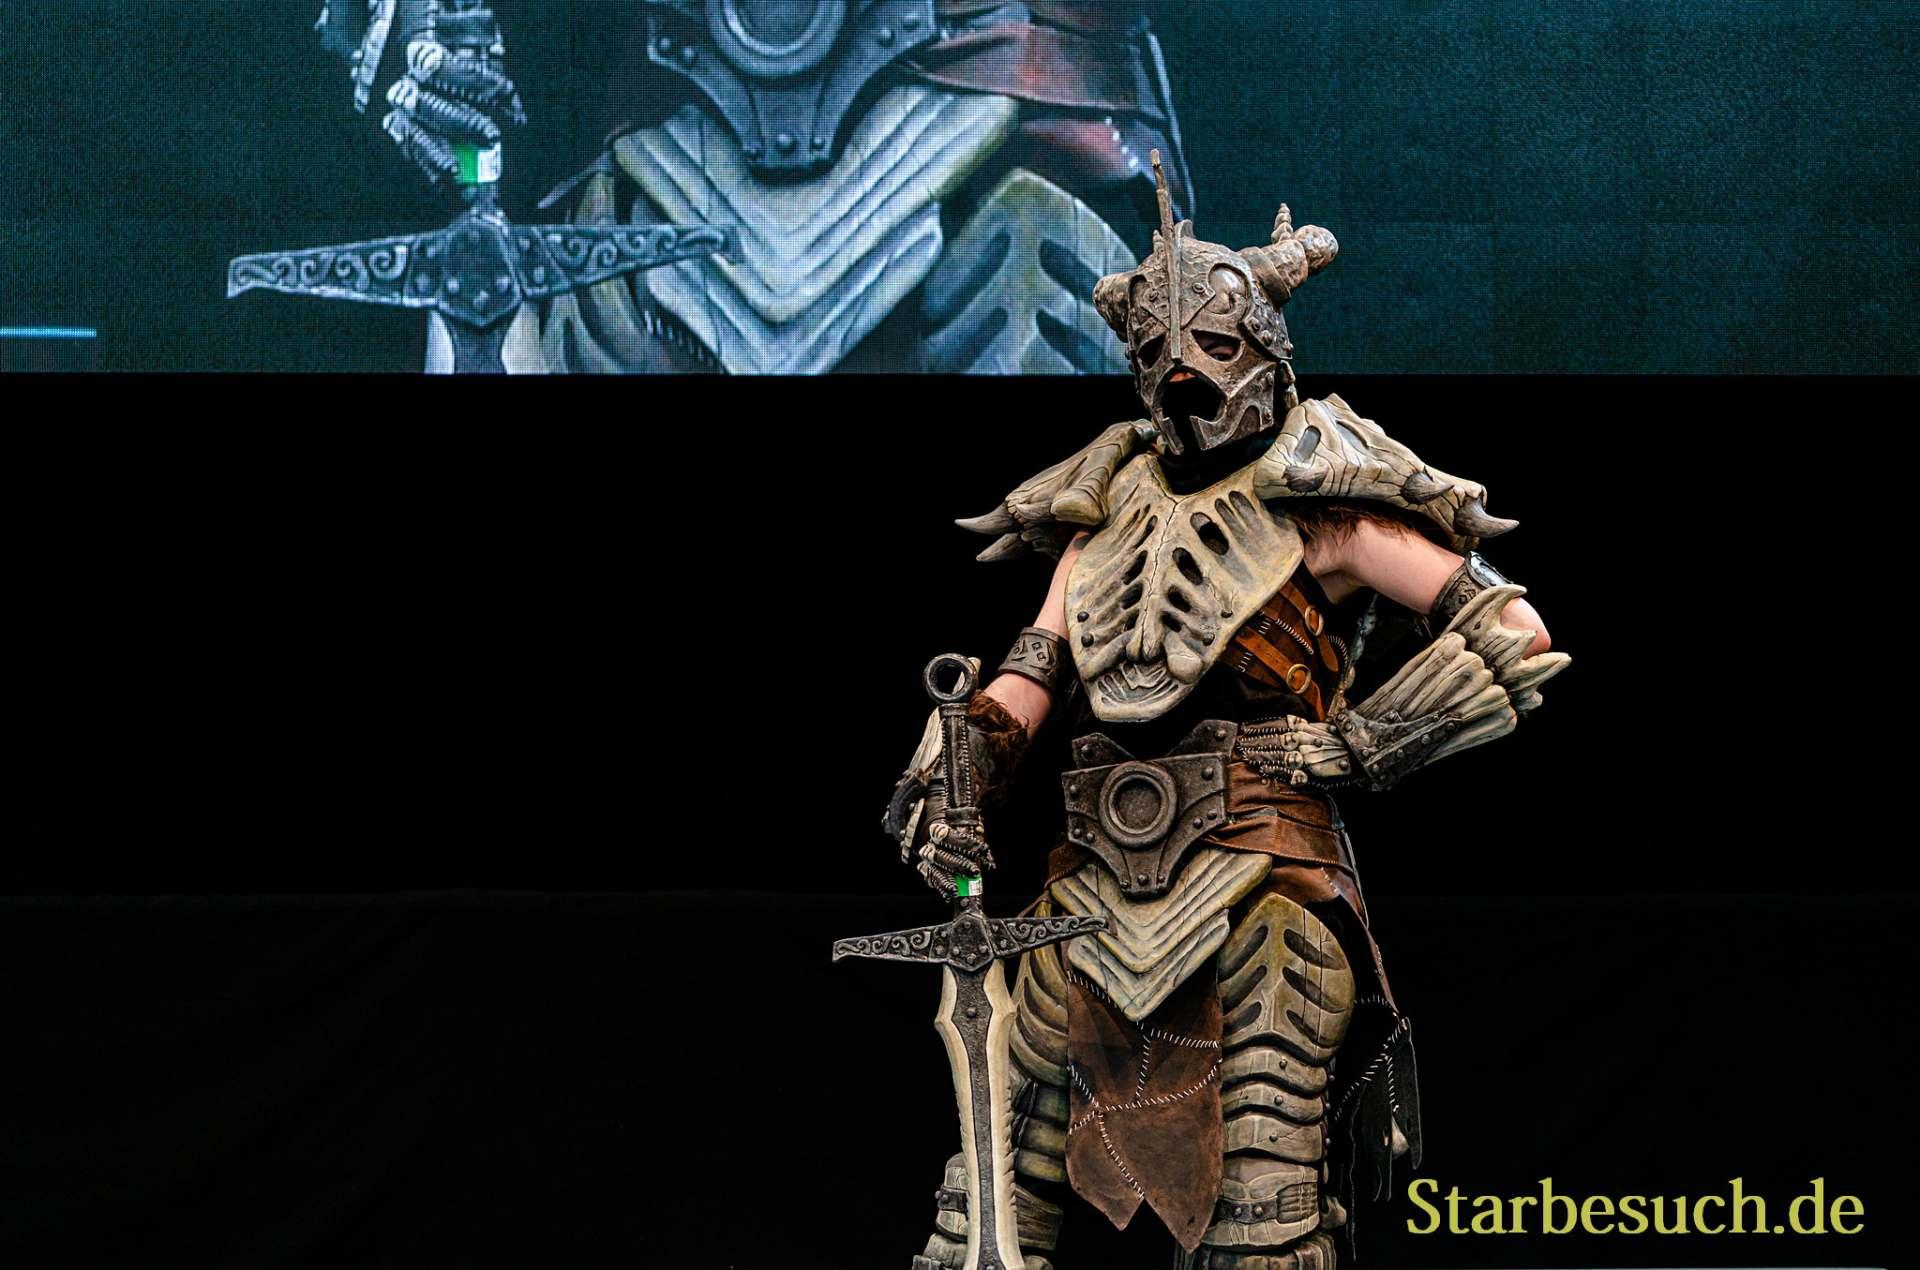 Cosplay Contest #7: Schildwand Cosplay as Drachenknochen Ruestung from Skyrim